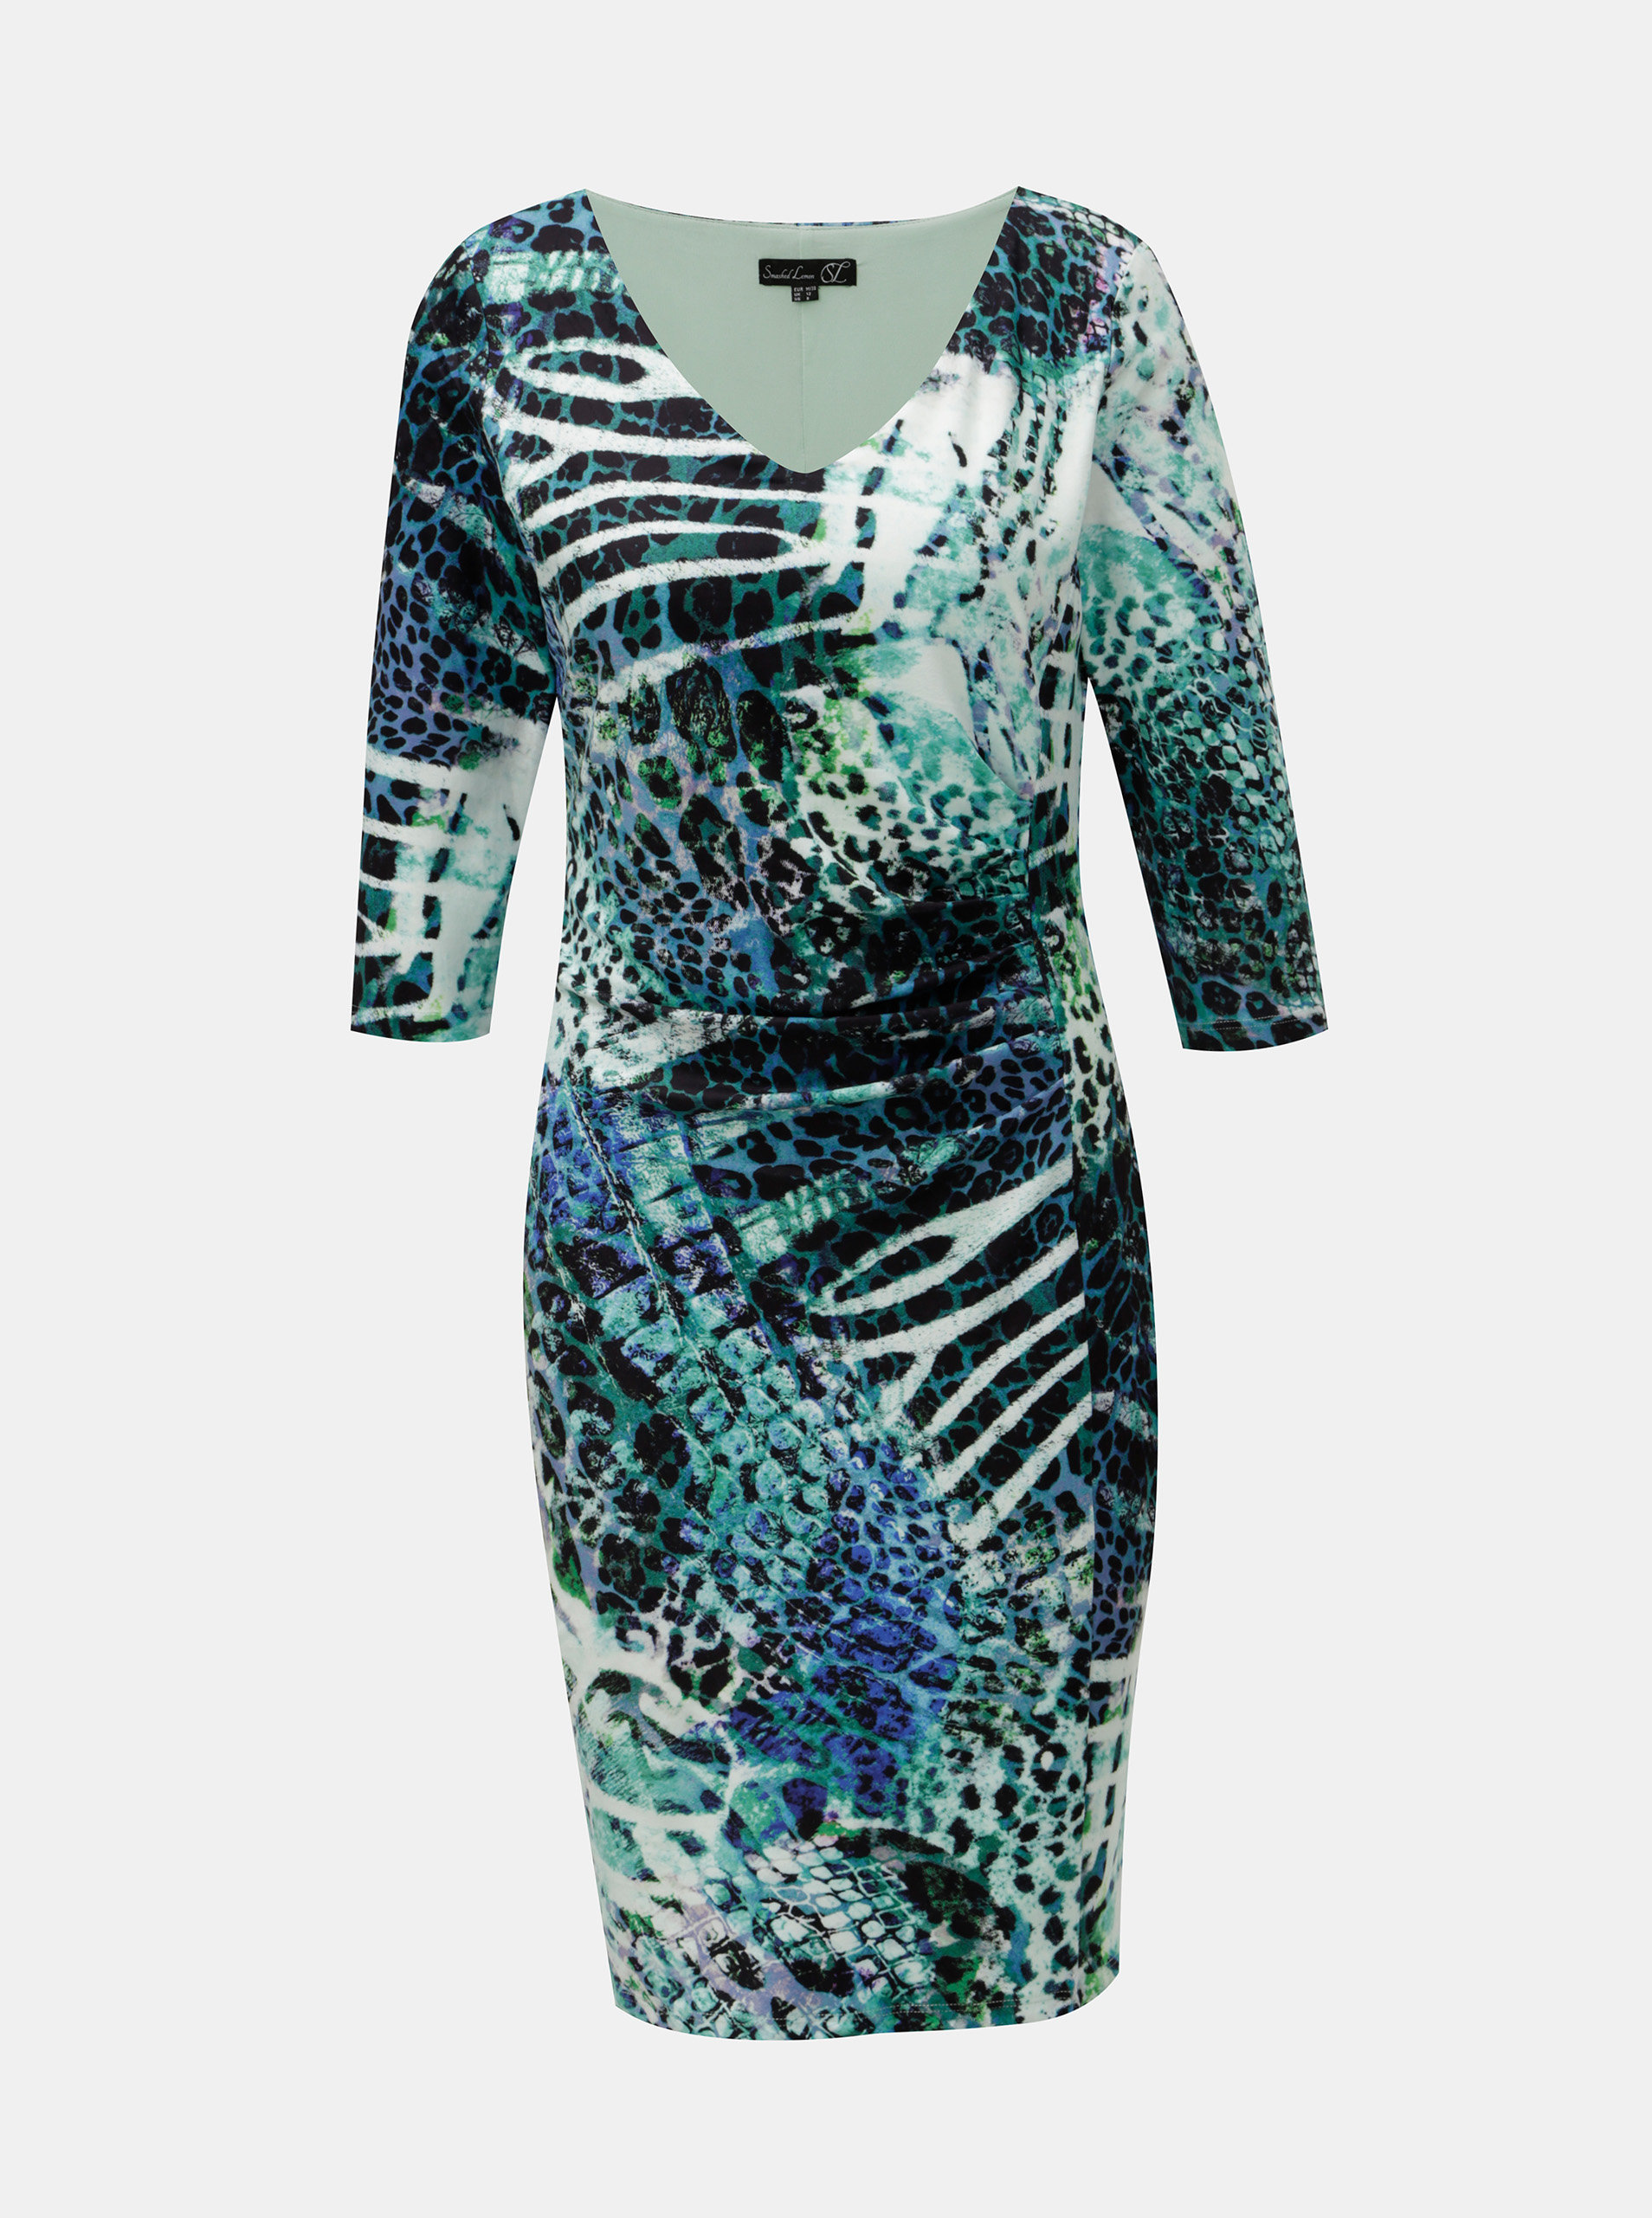 af274c62e496 Modro–zelené vzorované šaty s riasením na boku Smashed Lemon ...